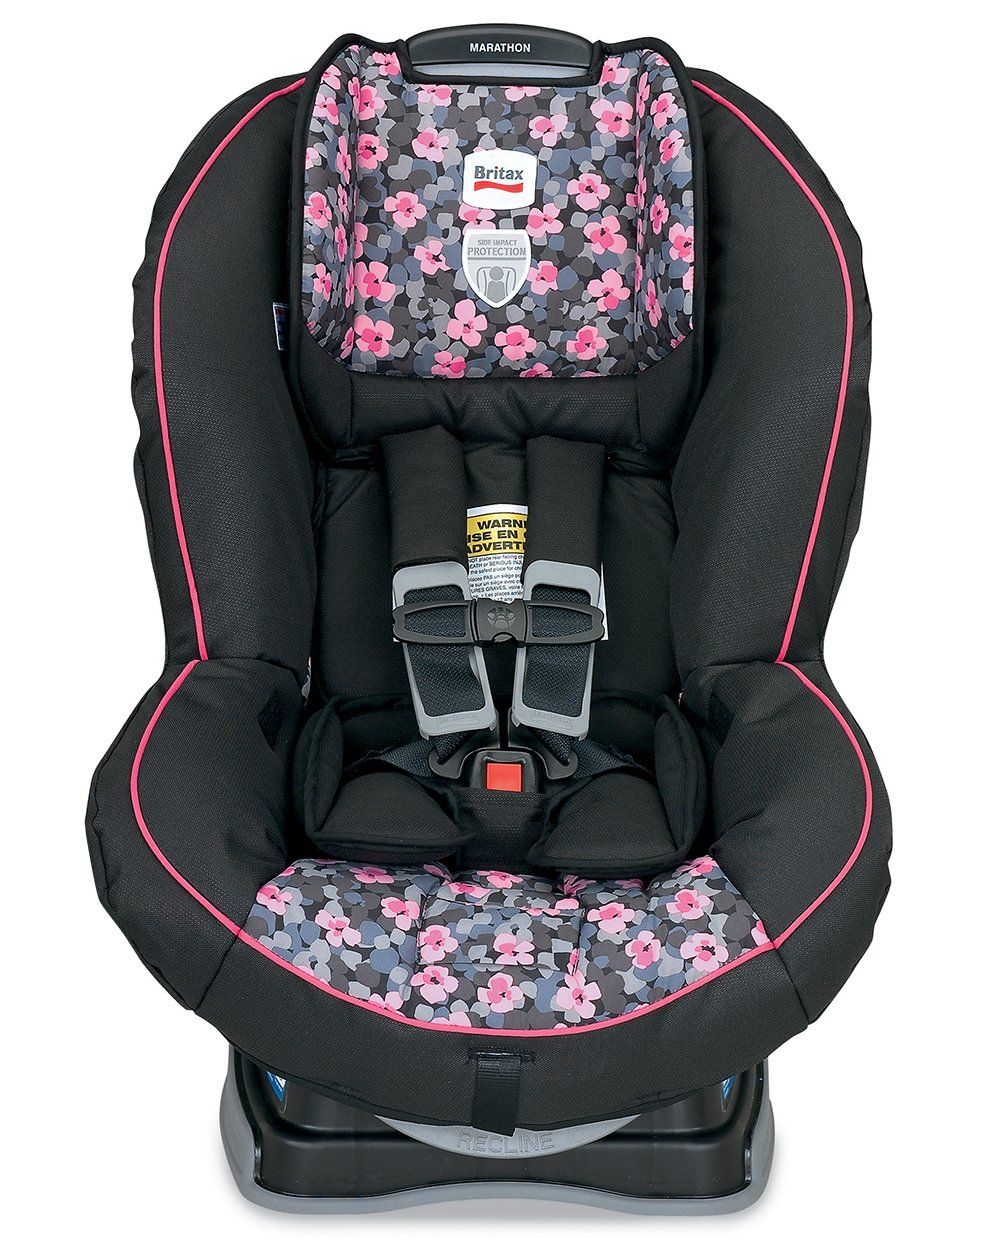 Britax Marathon G4 Convertible Car Seat, Cactus Flower